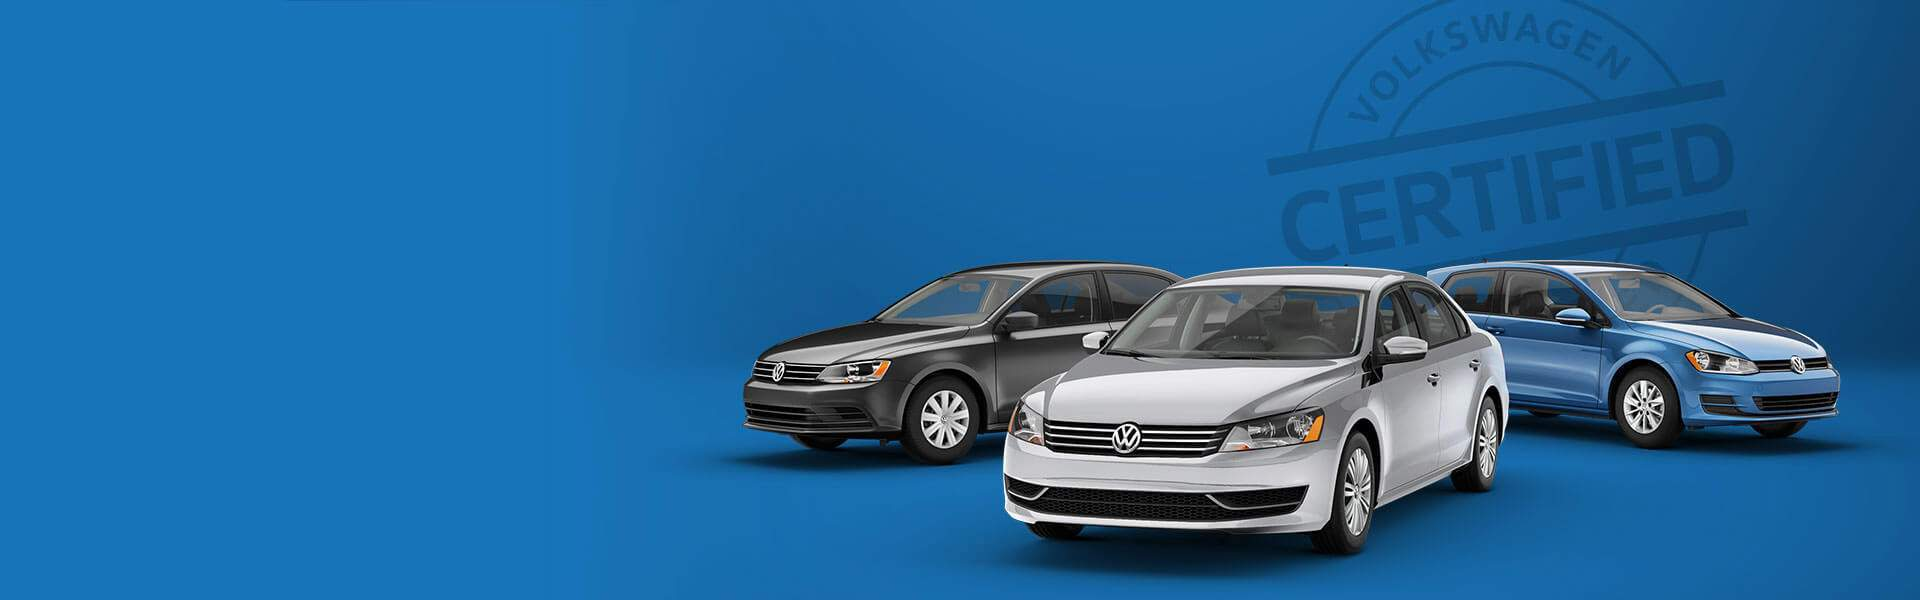 Volkswagen Certified Pre-Owned in South Jersey, NJ